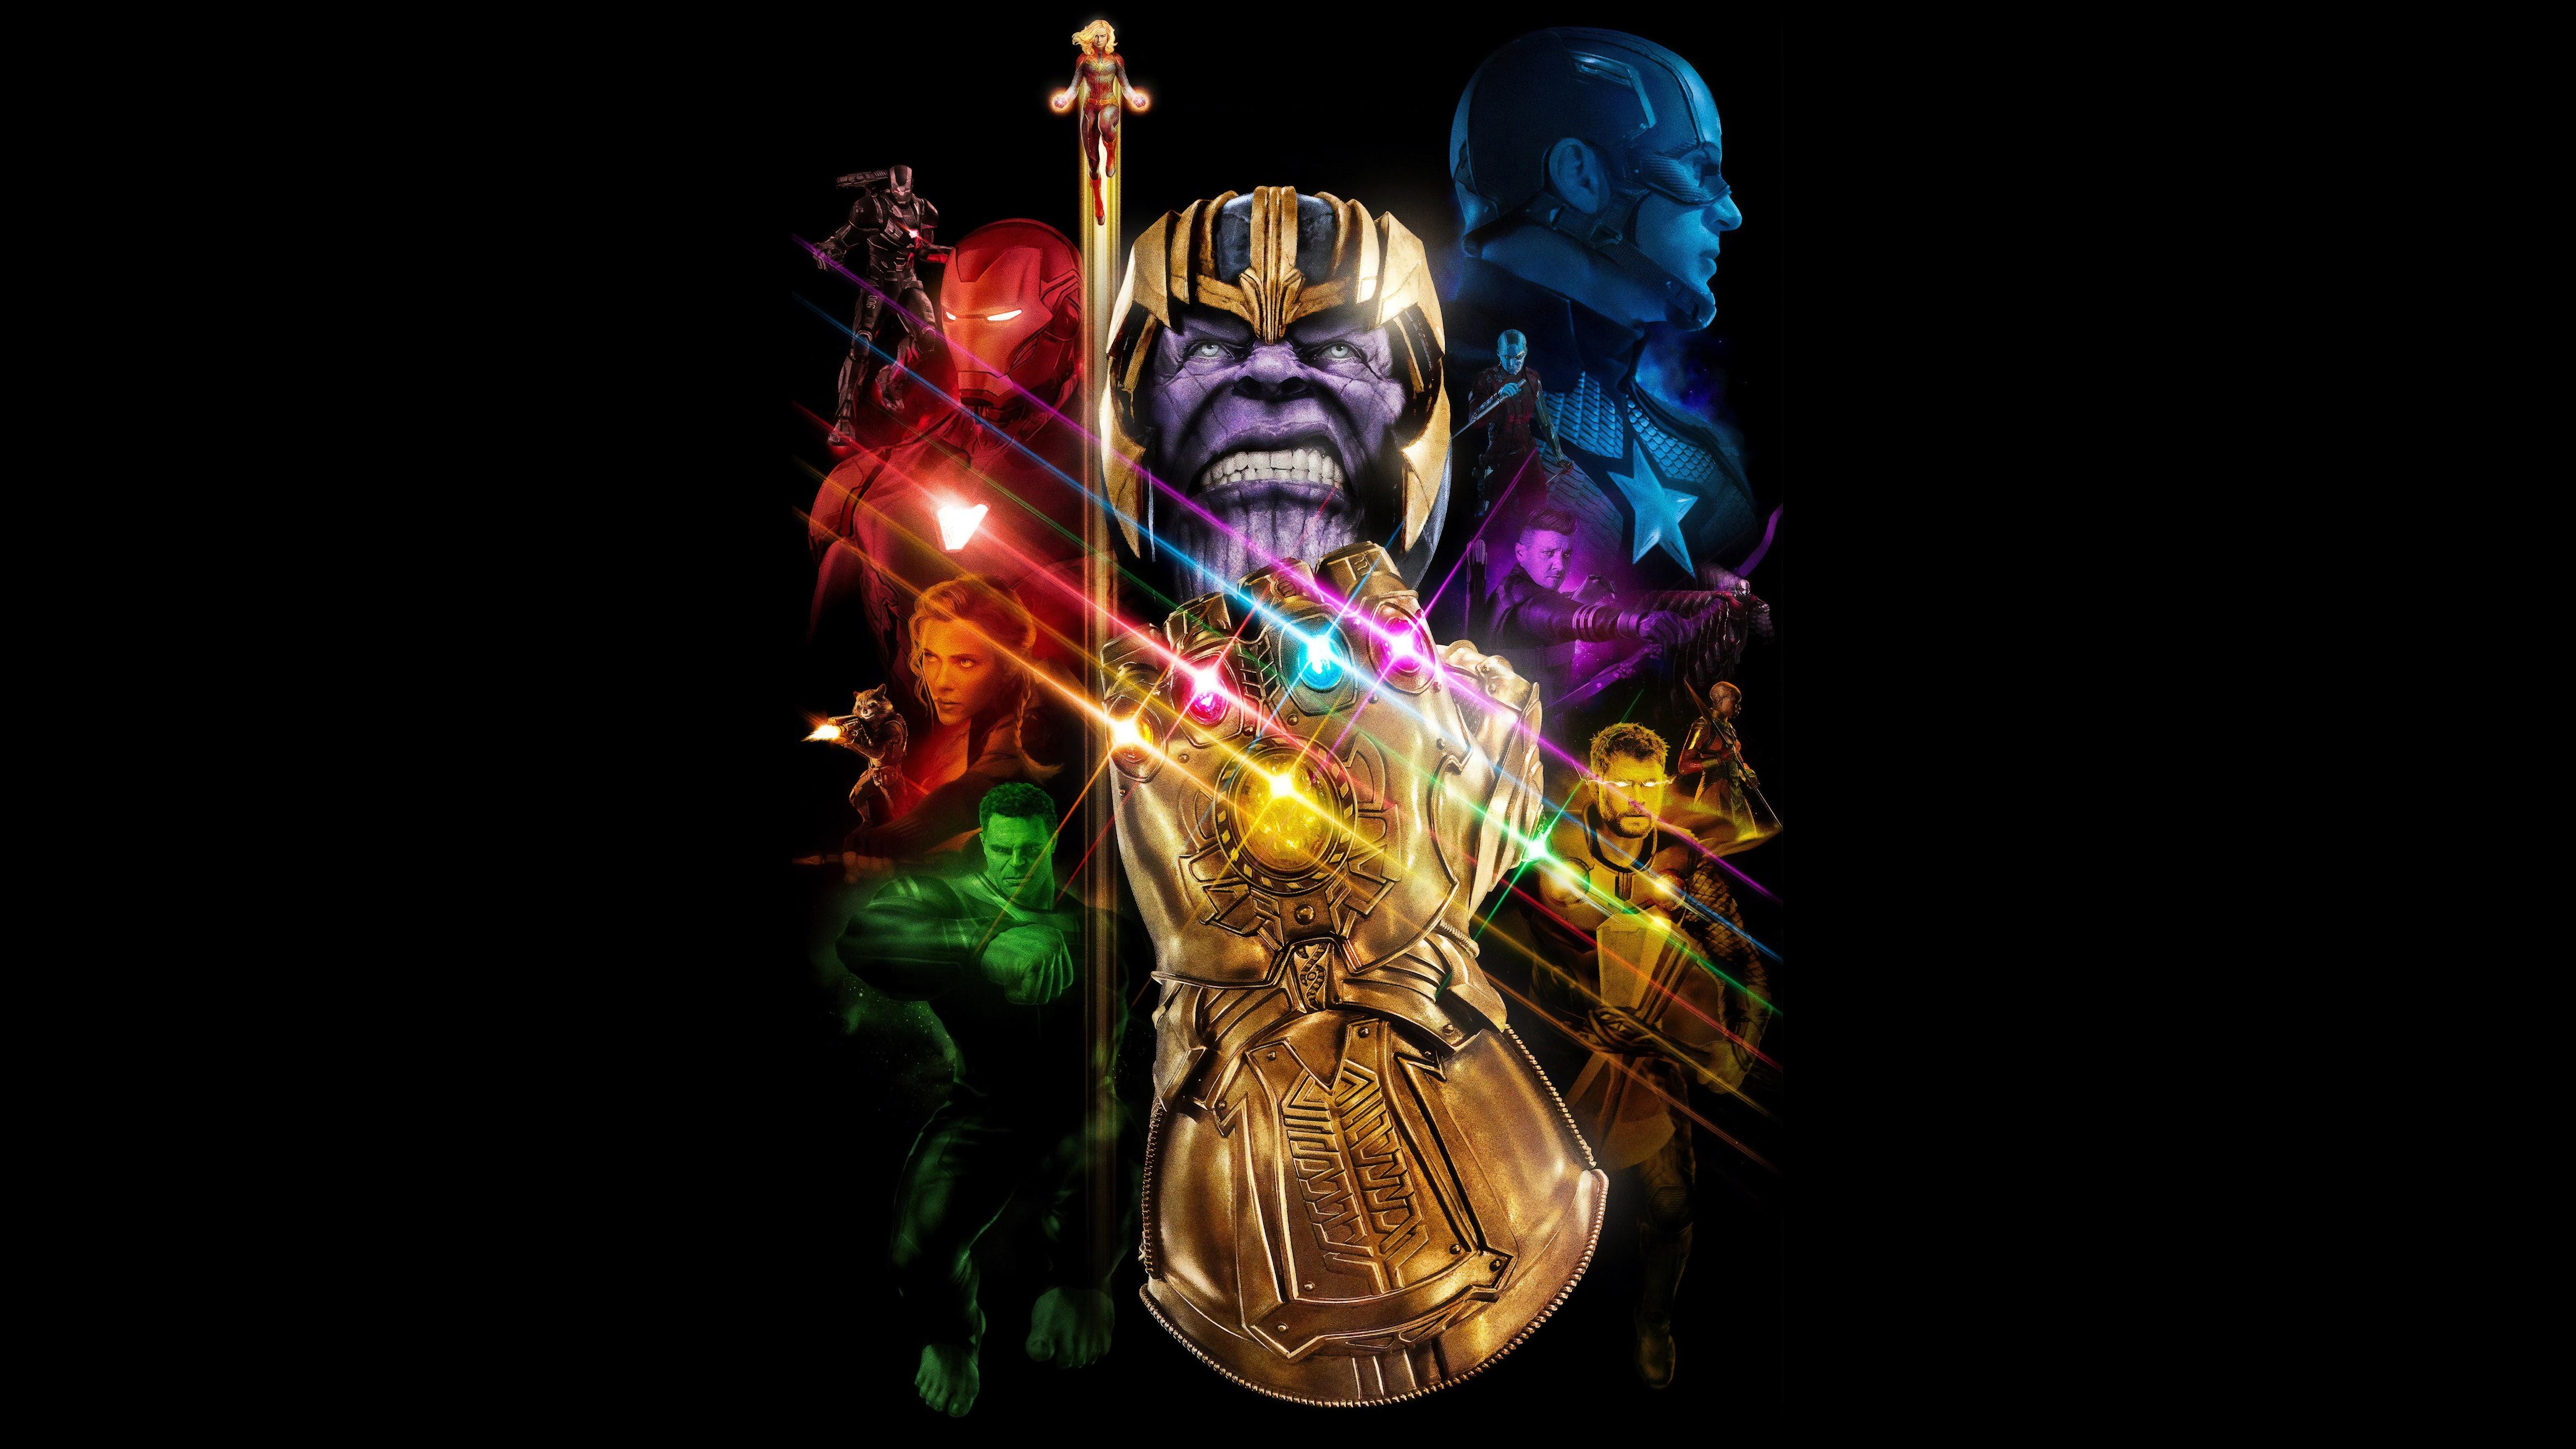 Avengers: Endgame, Thanos, Infinity Gauntlet, 4K, #142 ...